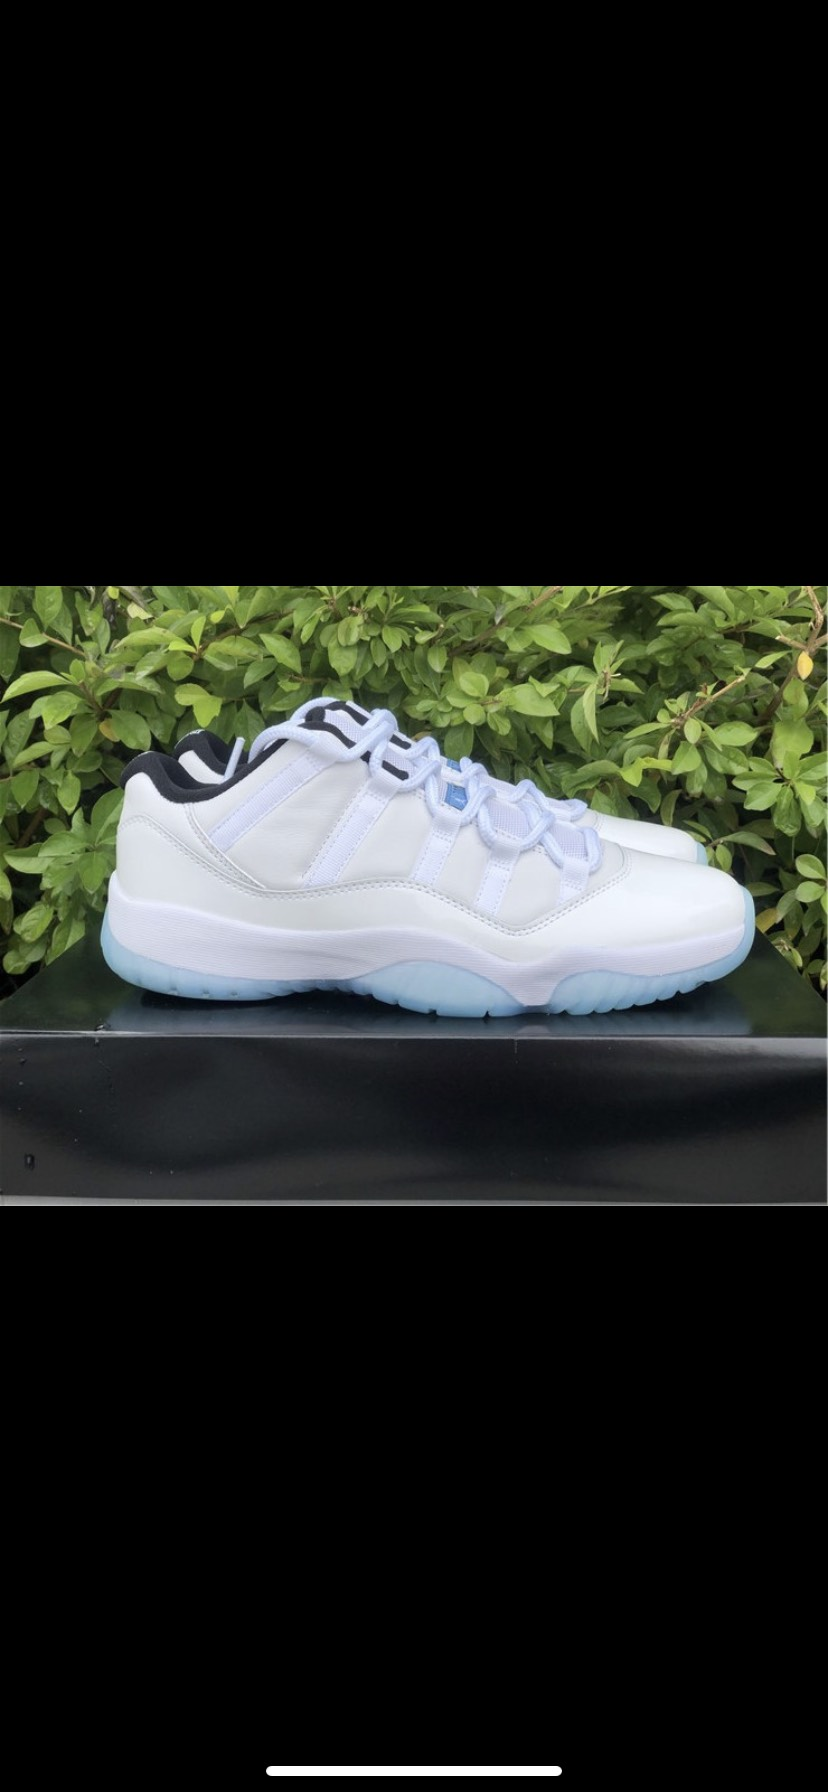 Air Jordan - $220 - Size 11